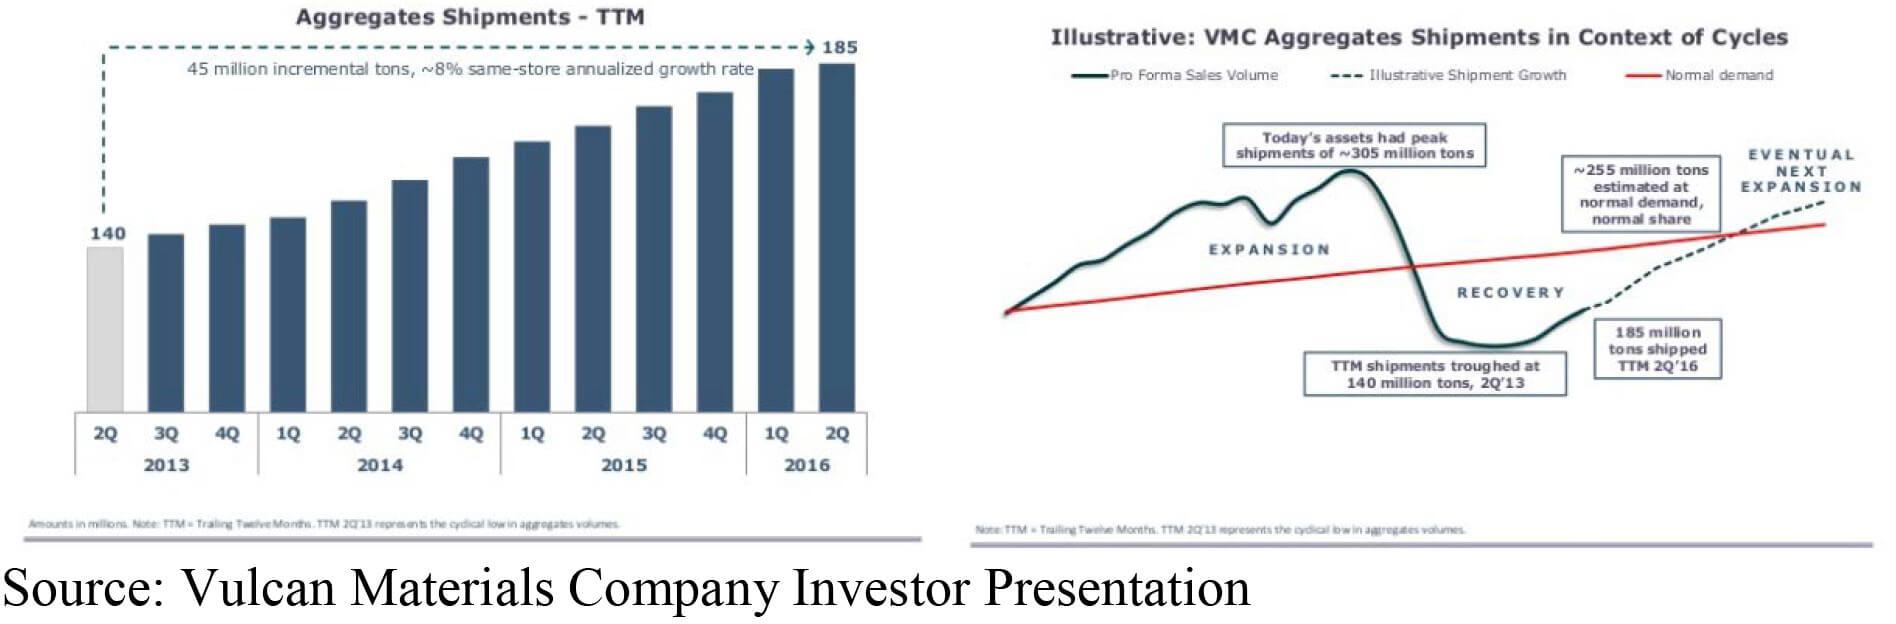 CUSDAF_January-2017-Vulcan-Materiaks-Company